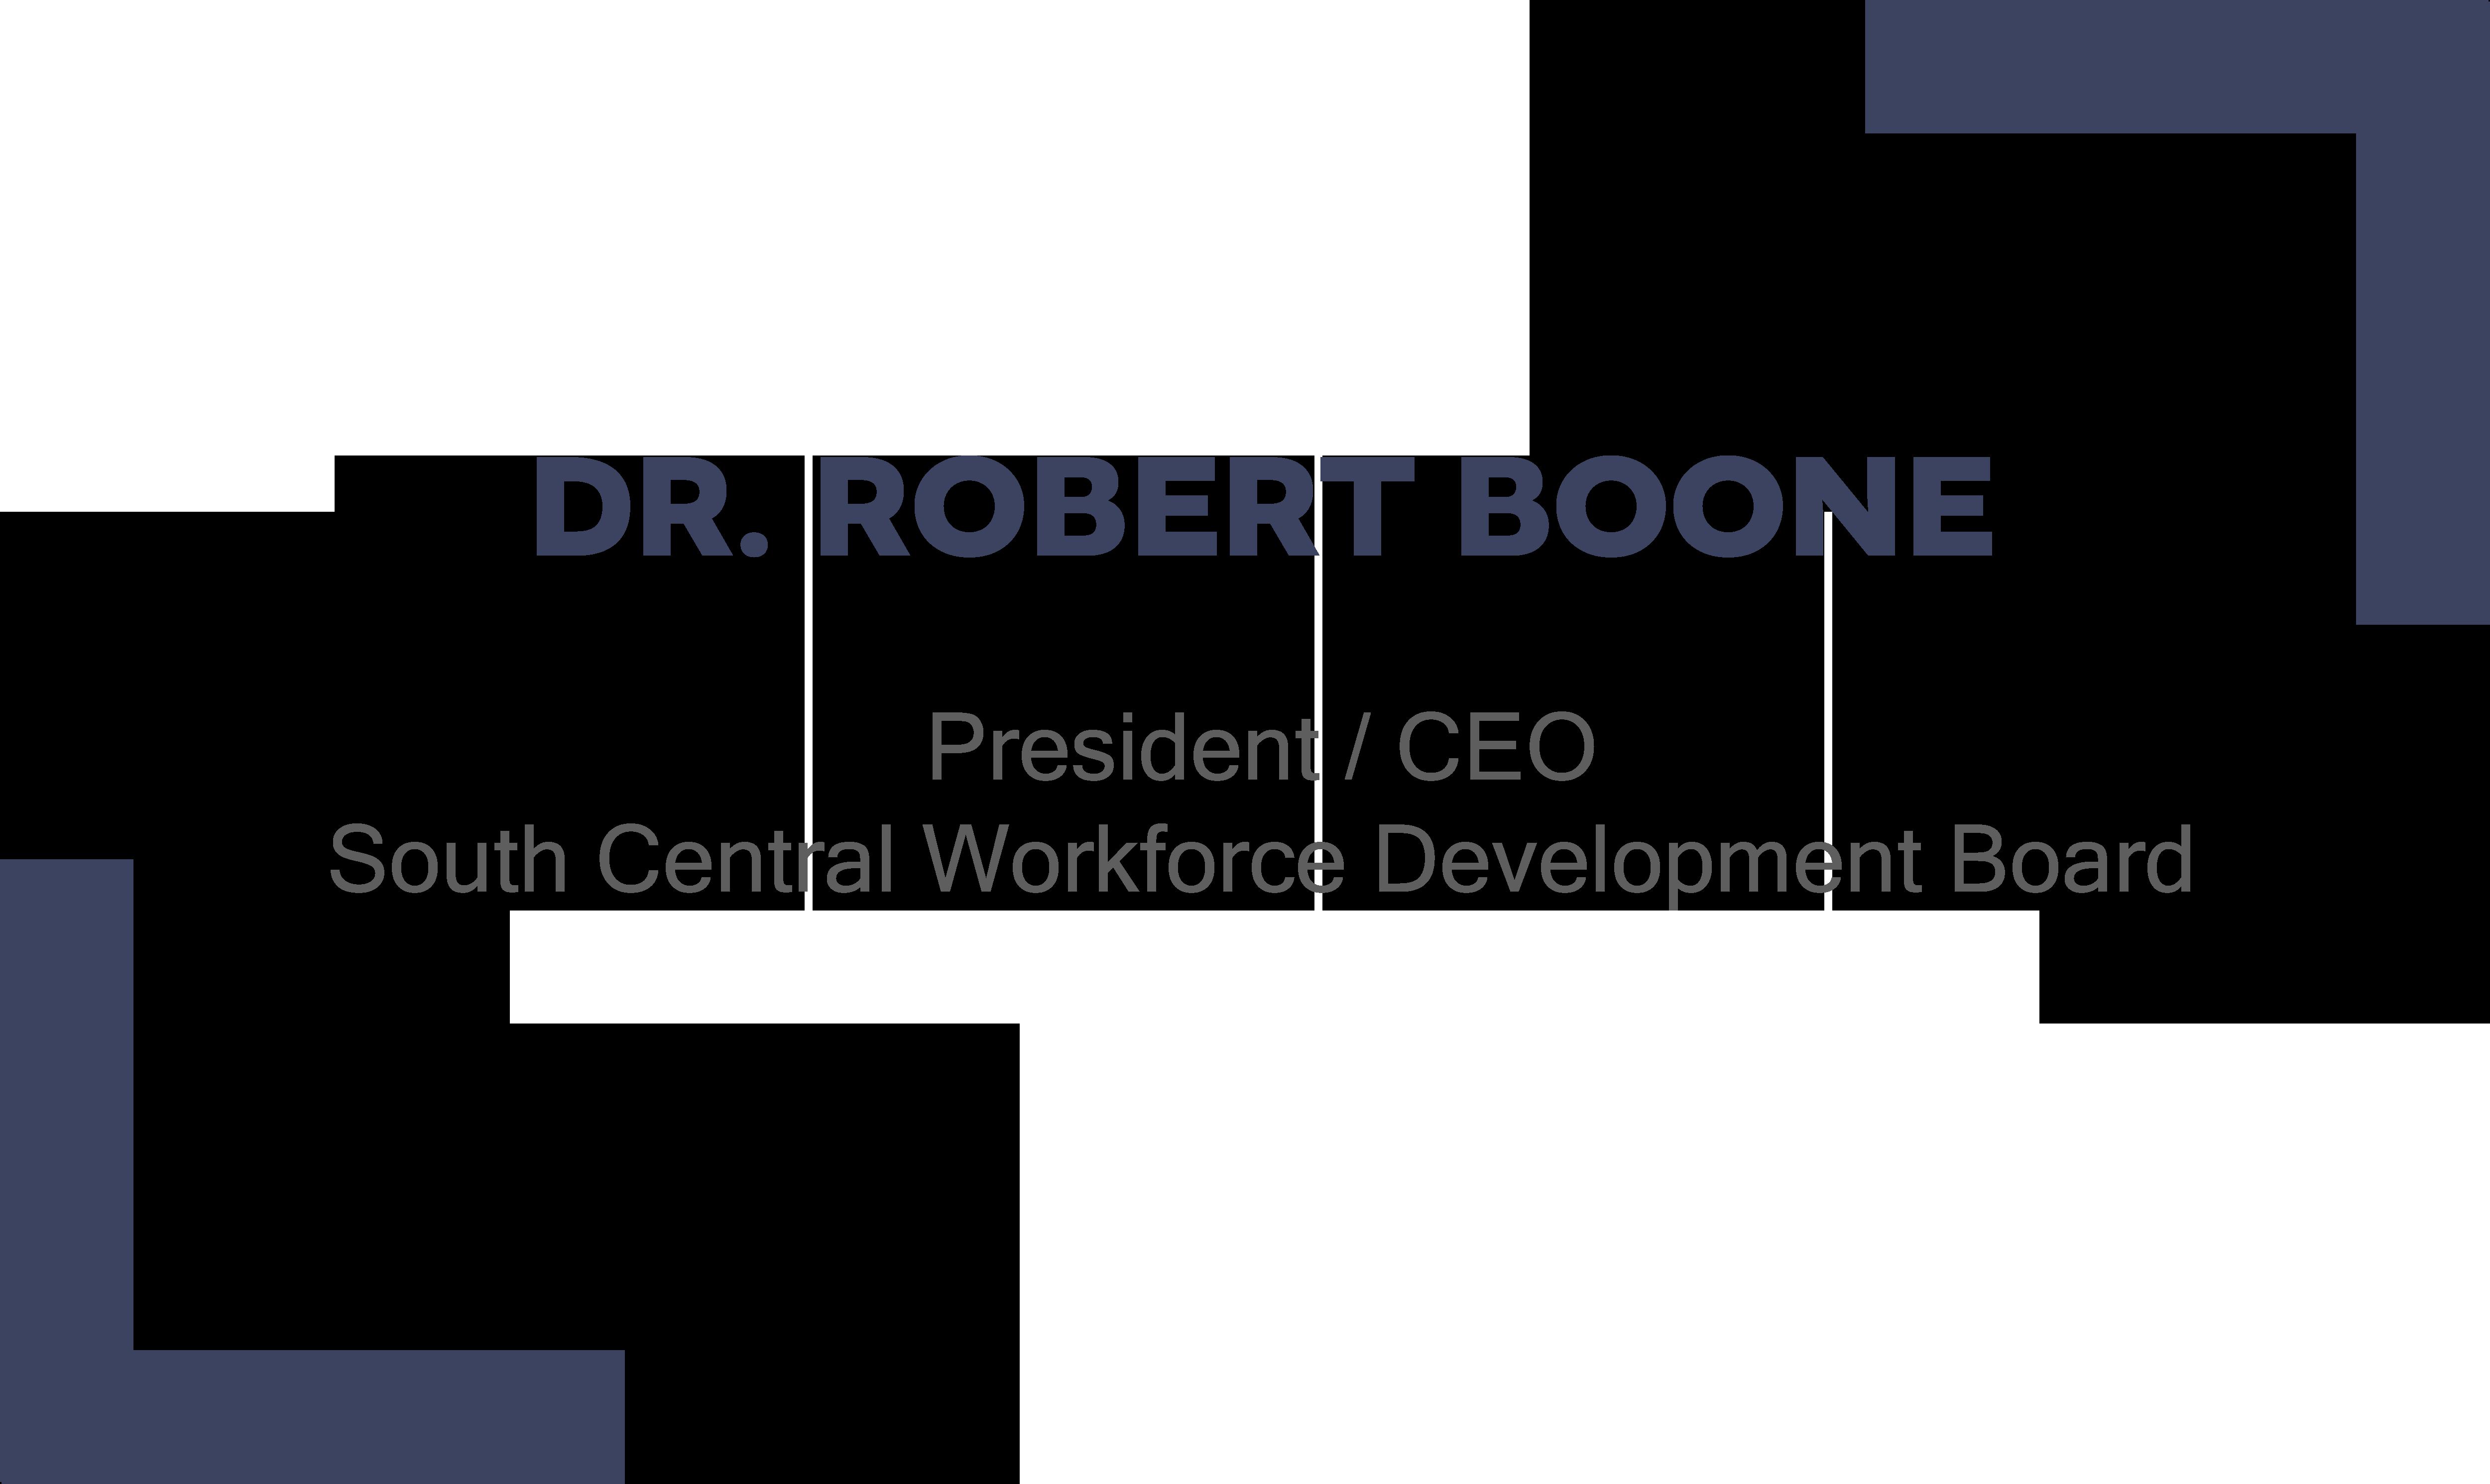 ROBERT BOONE